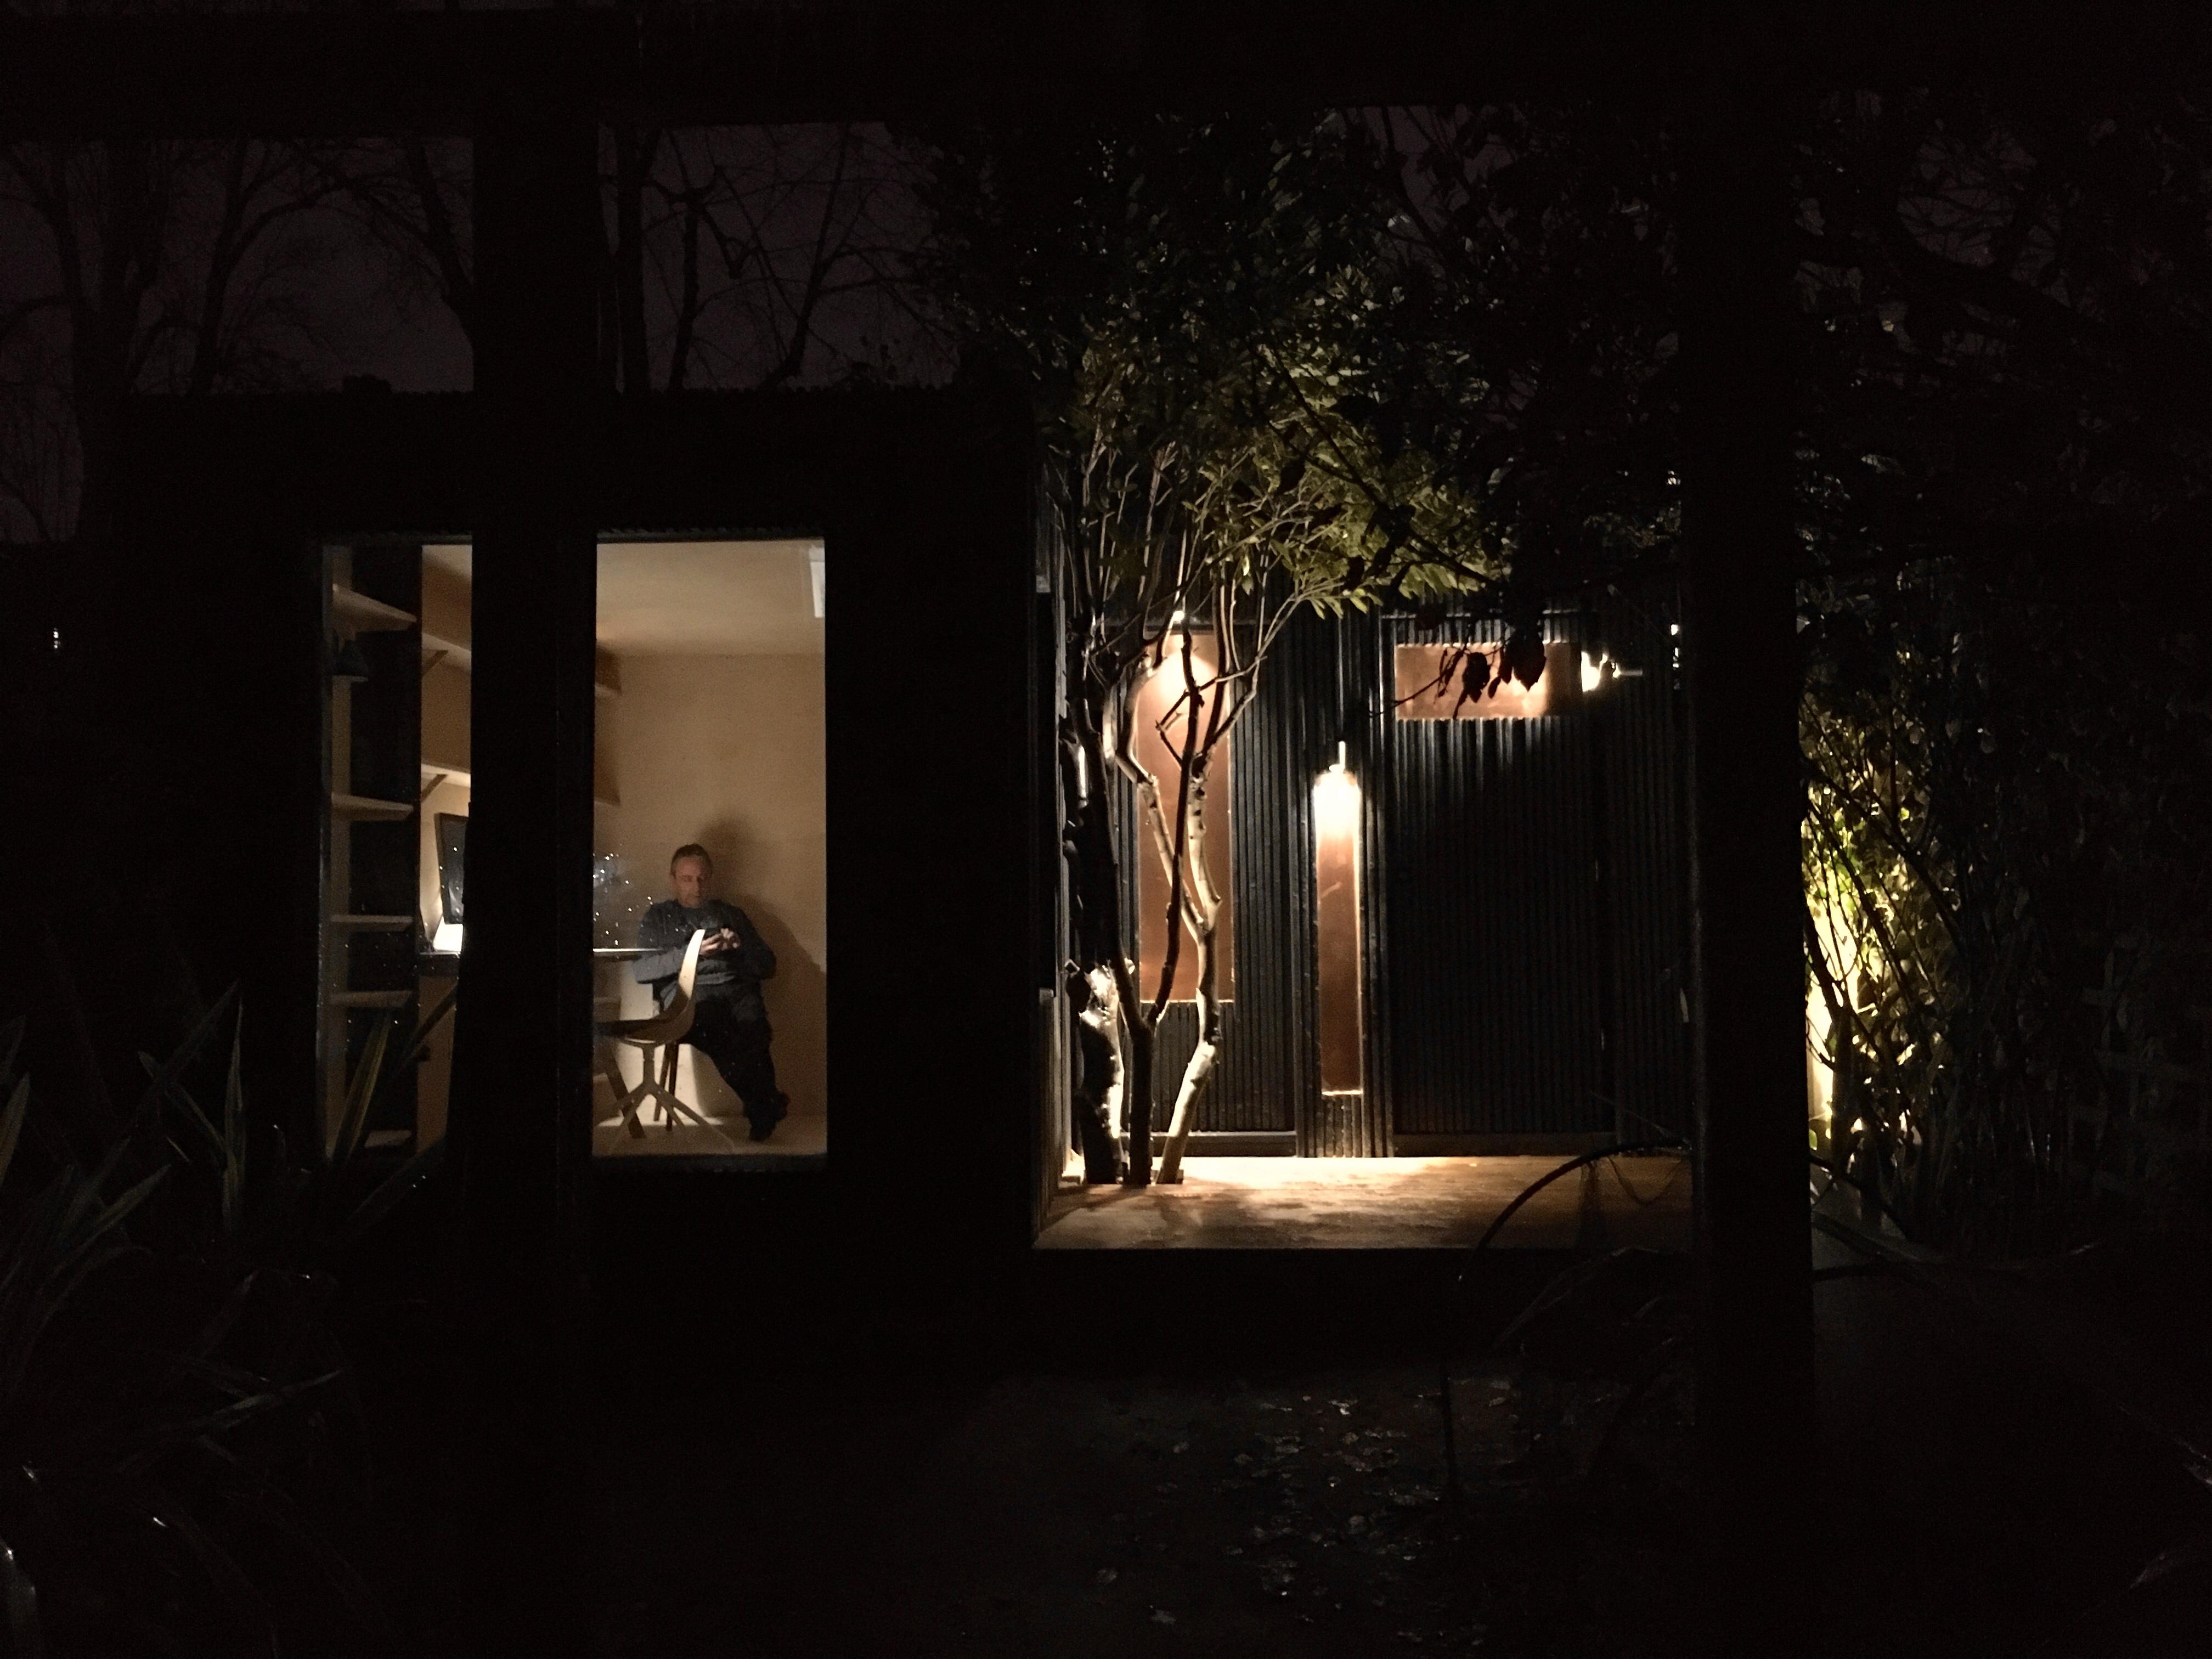 Summer house after dark